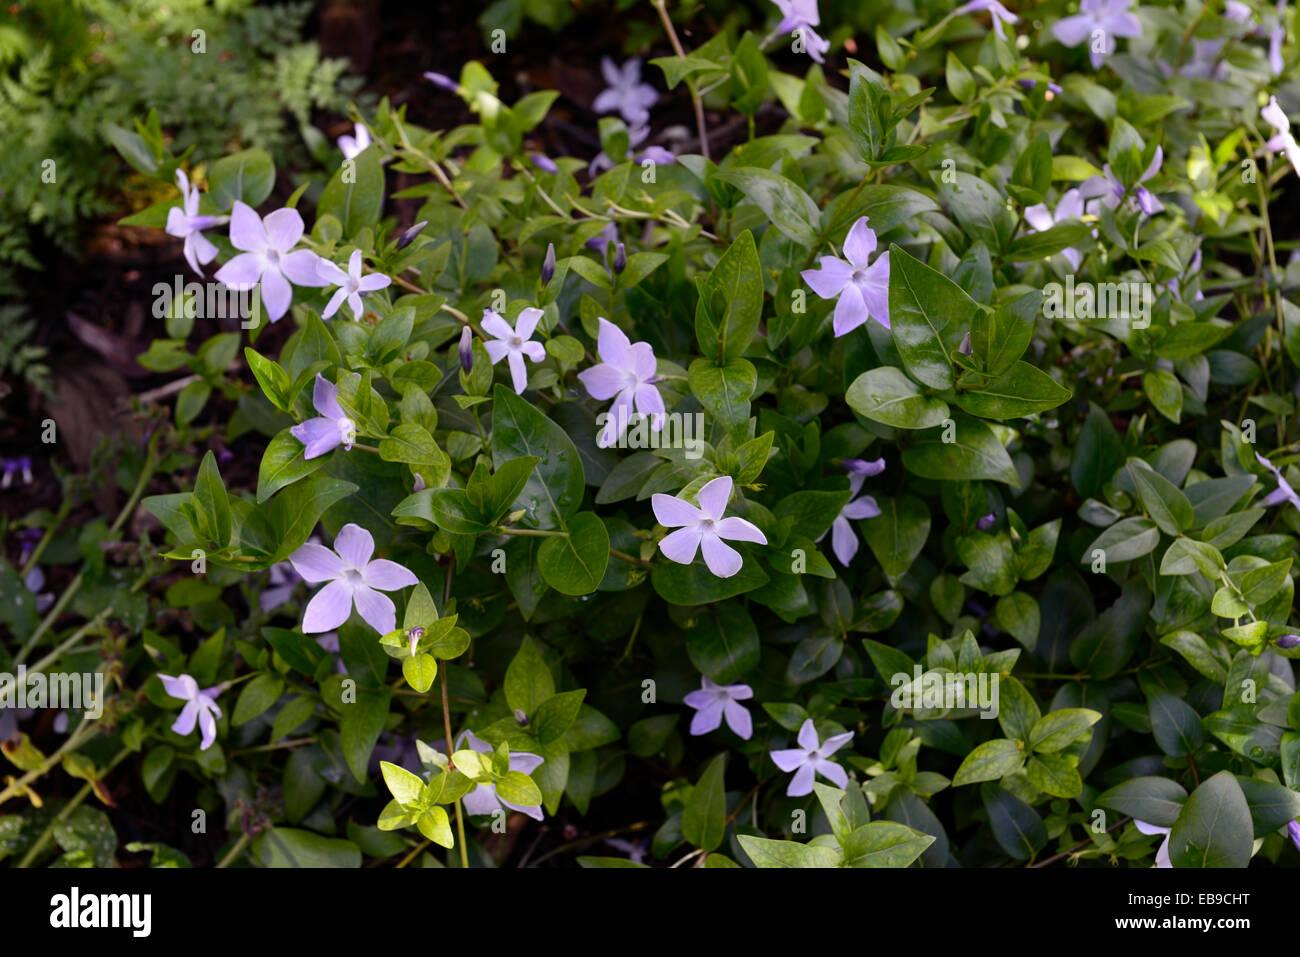 Vinca flowers immagini & vinca flowers fotos stock alamy